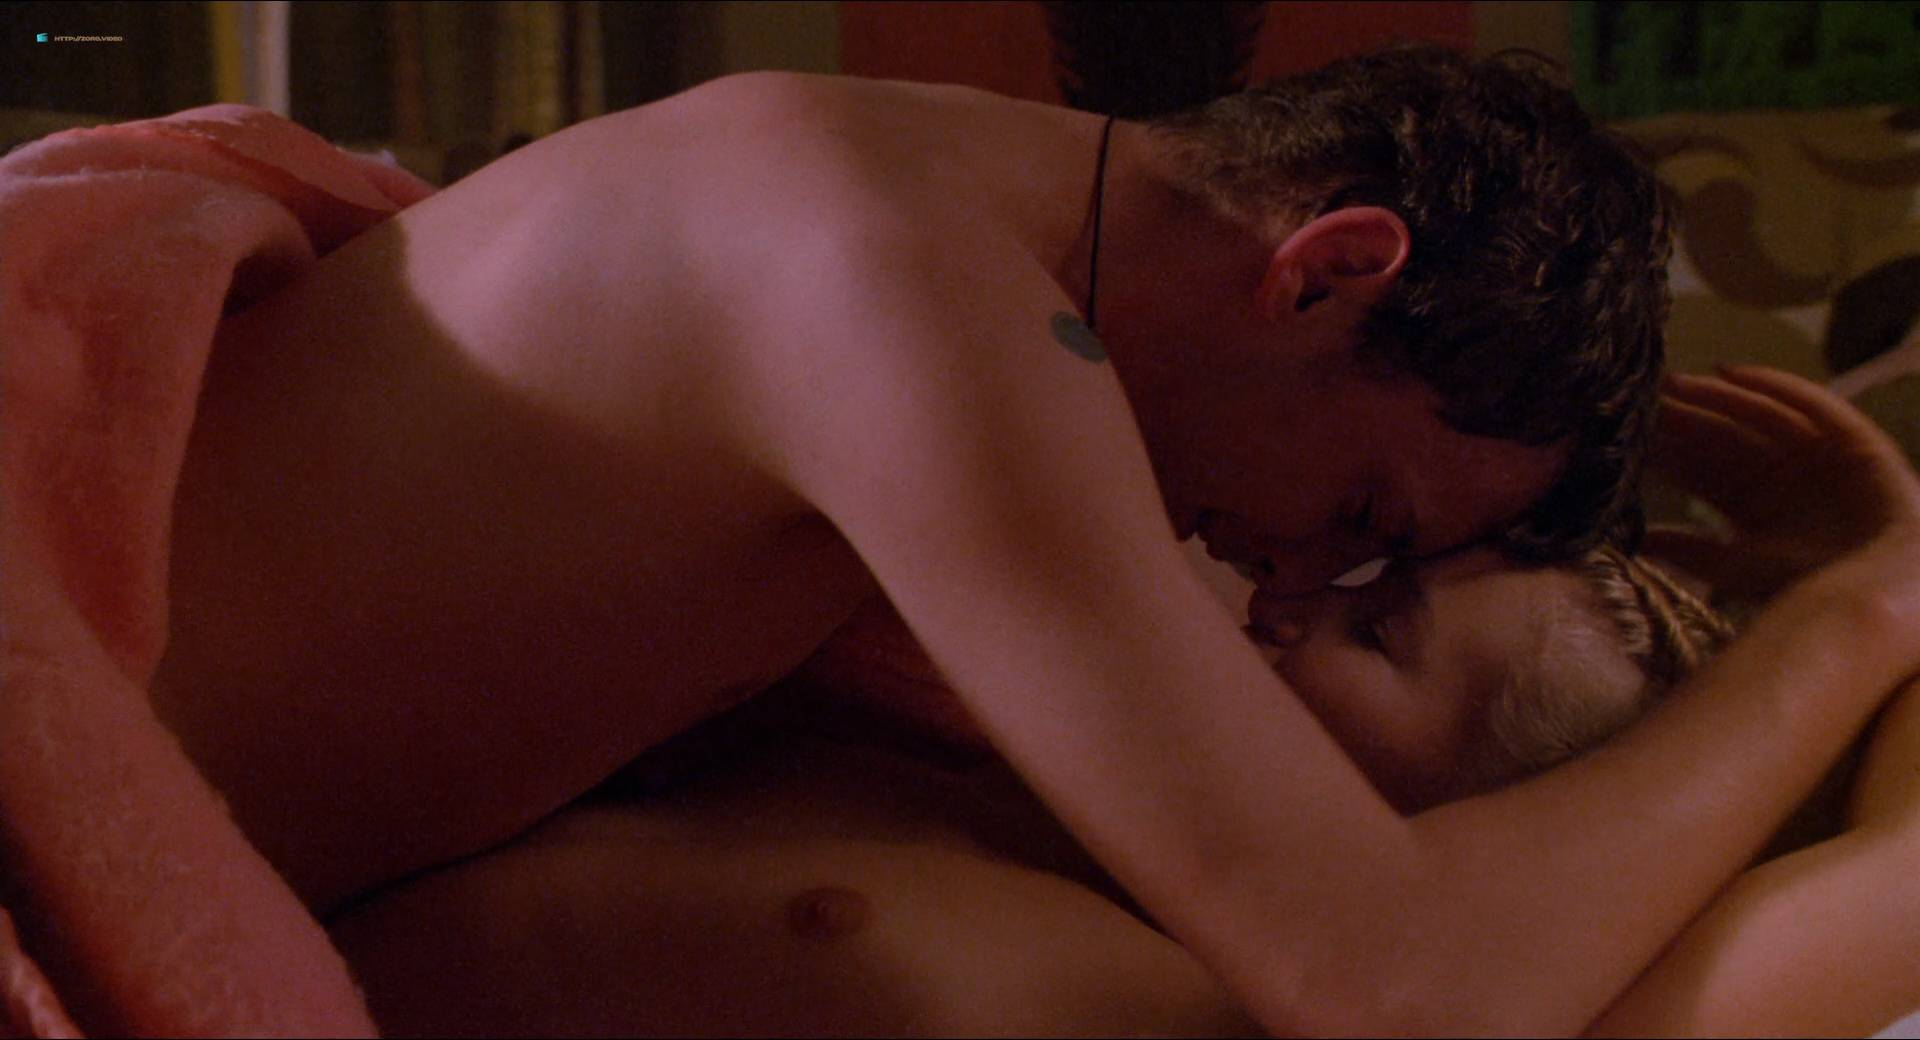 manumission live sex 1999